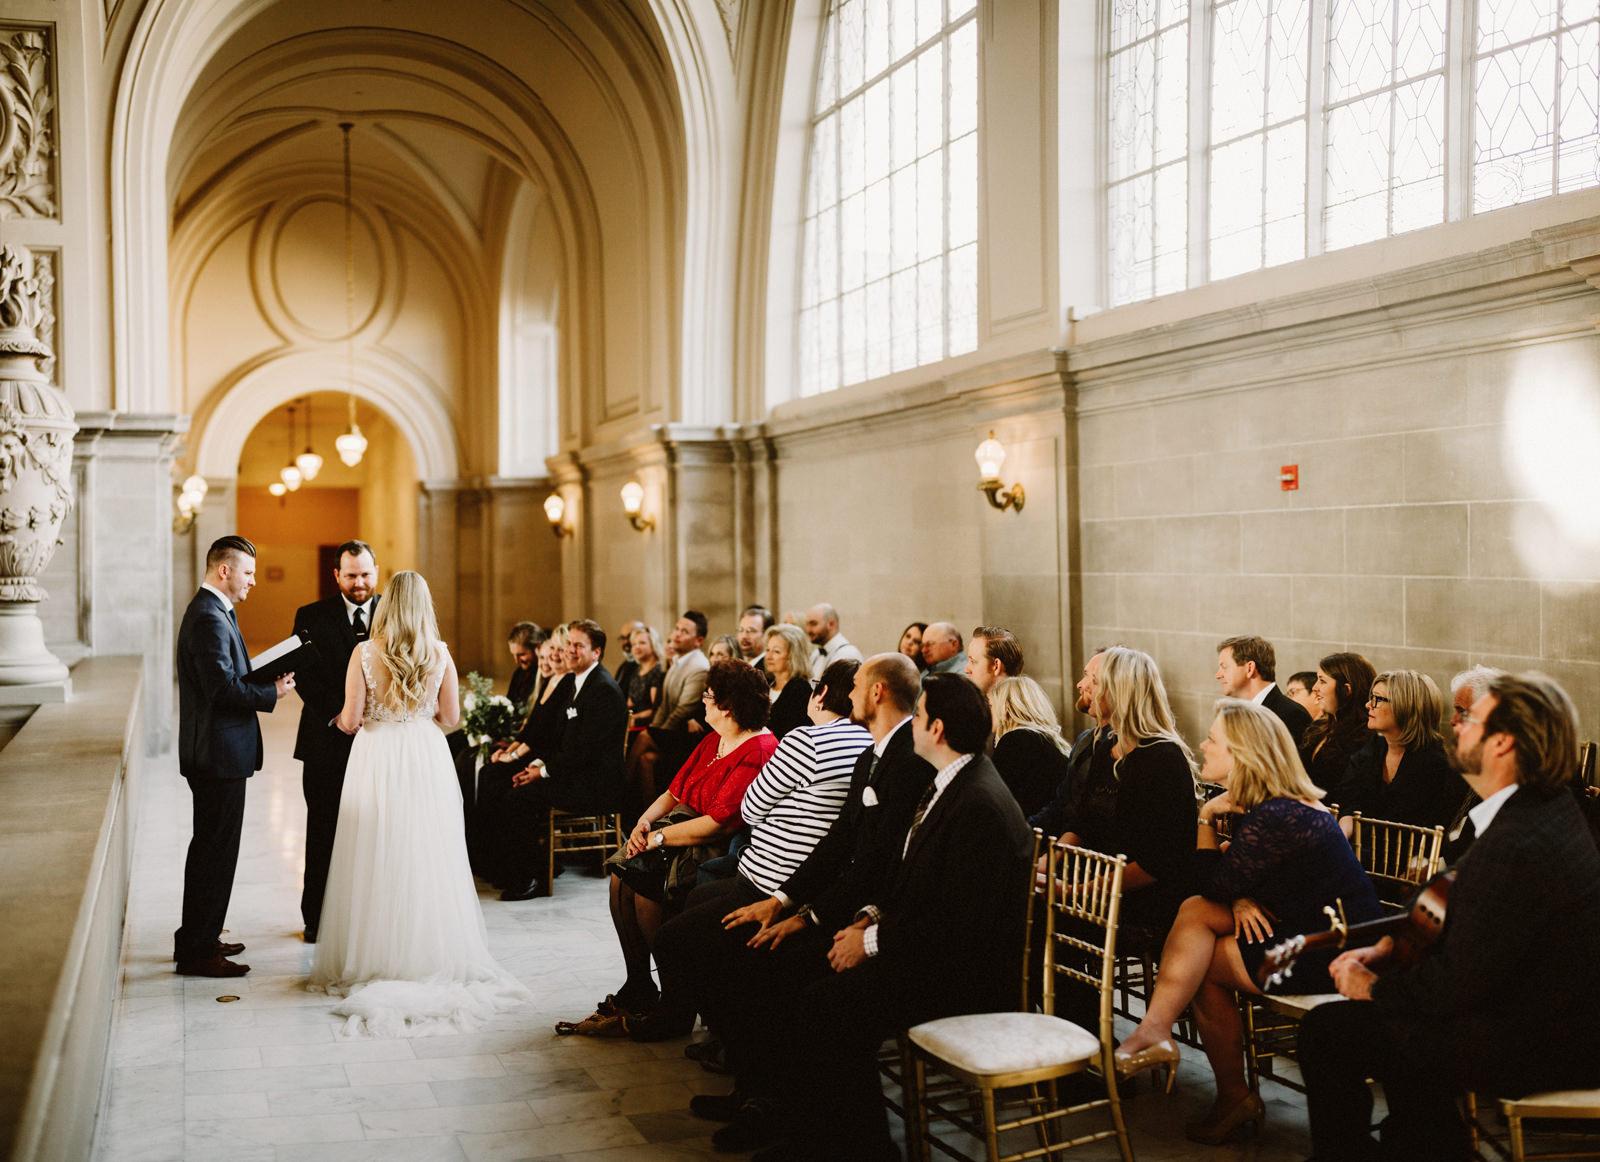 san-francisco-city-hall-elopement-22 SAN FRANCISCO CITY HALL INTIMATE WEDDING